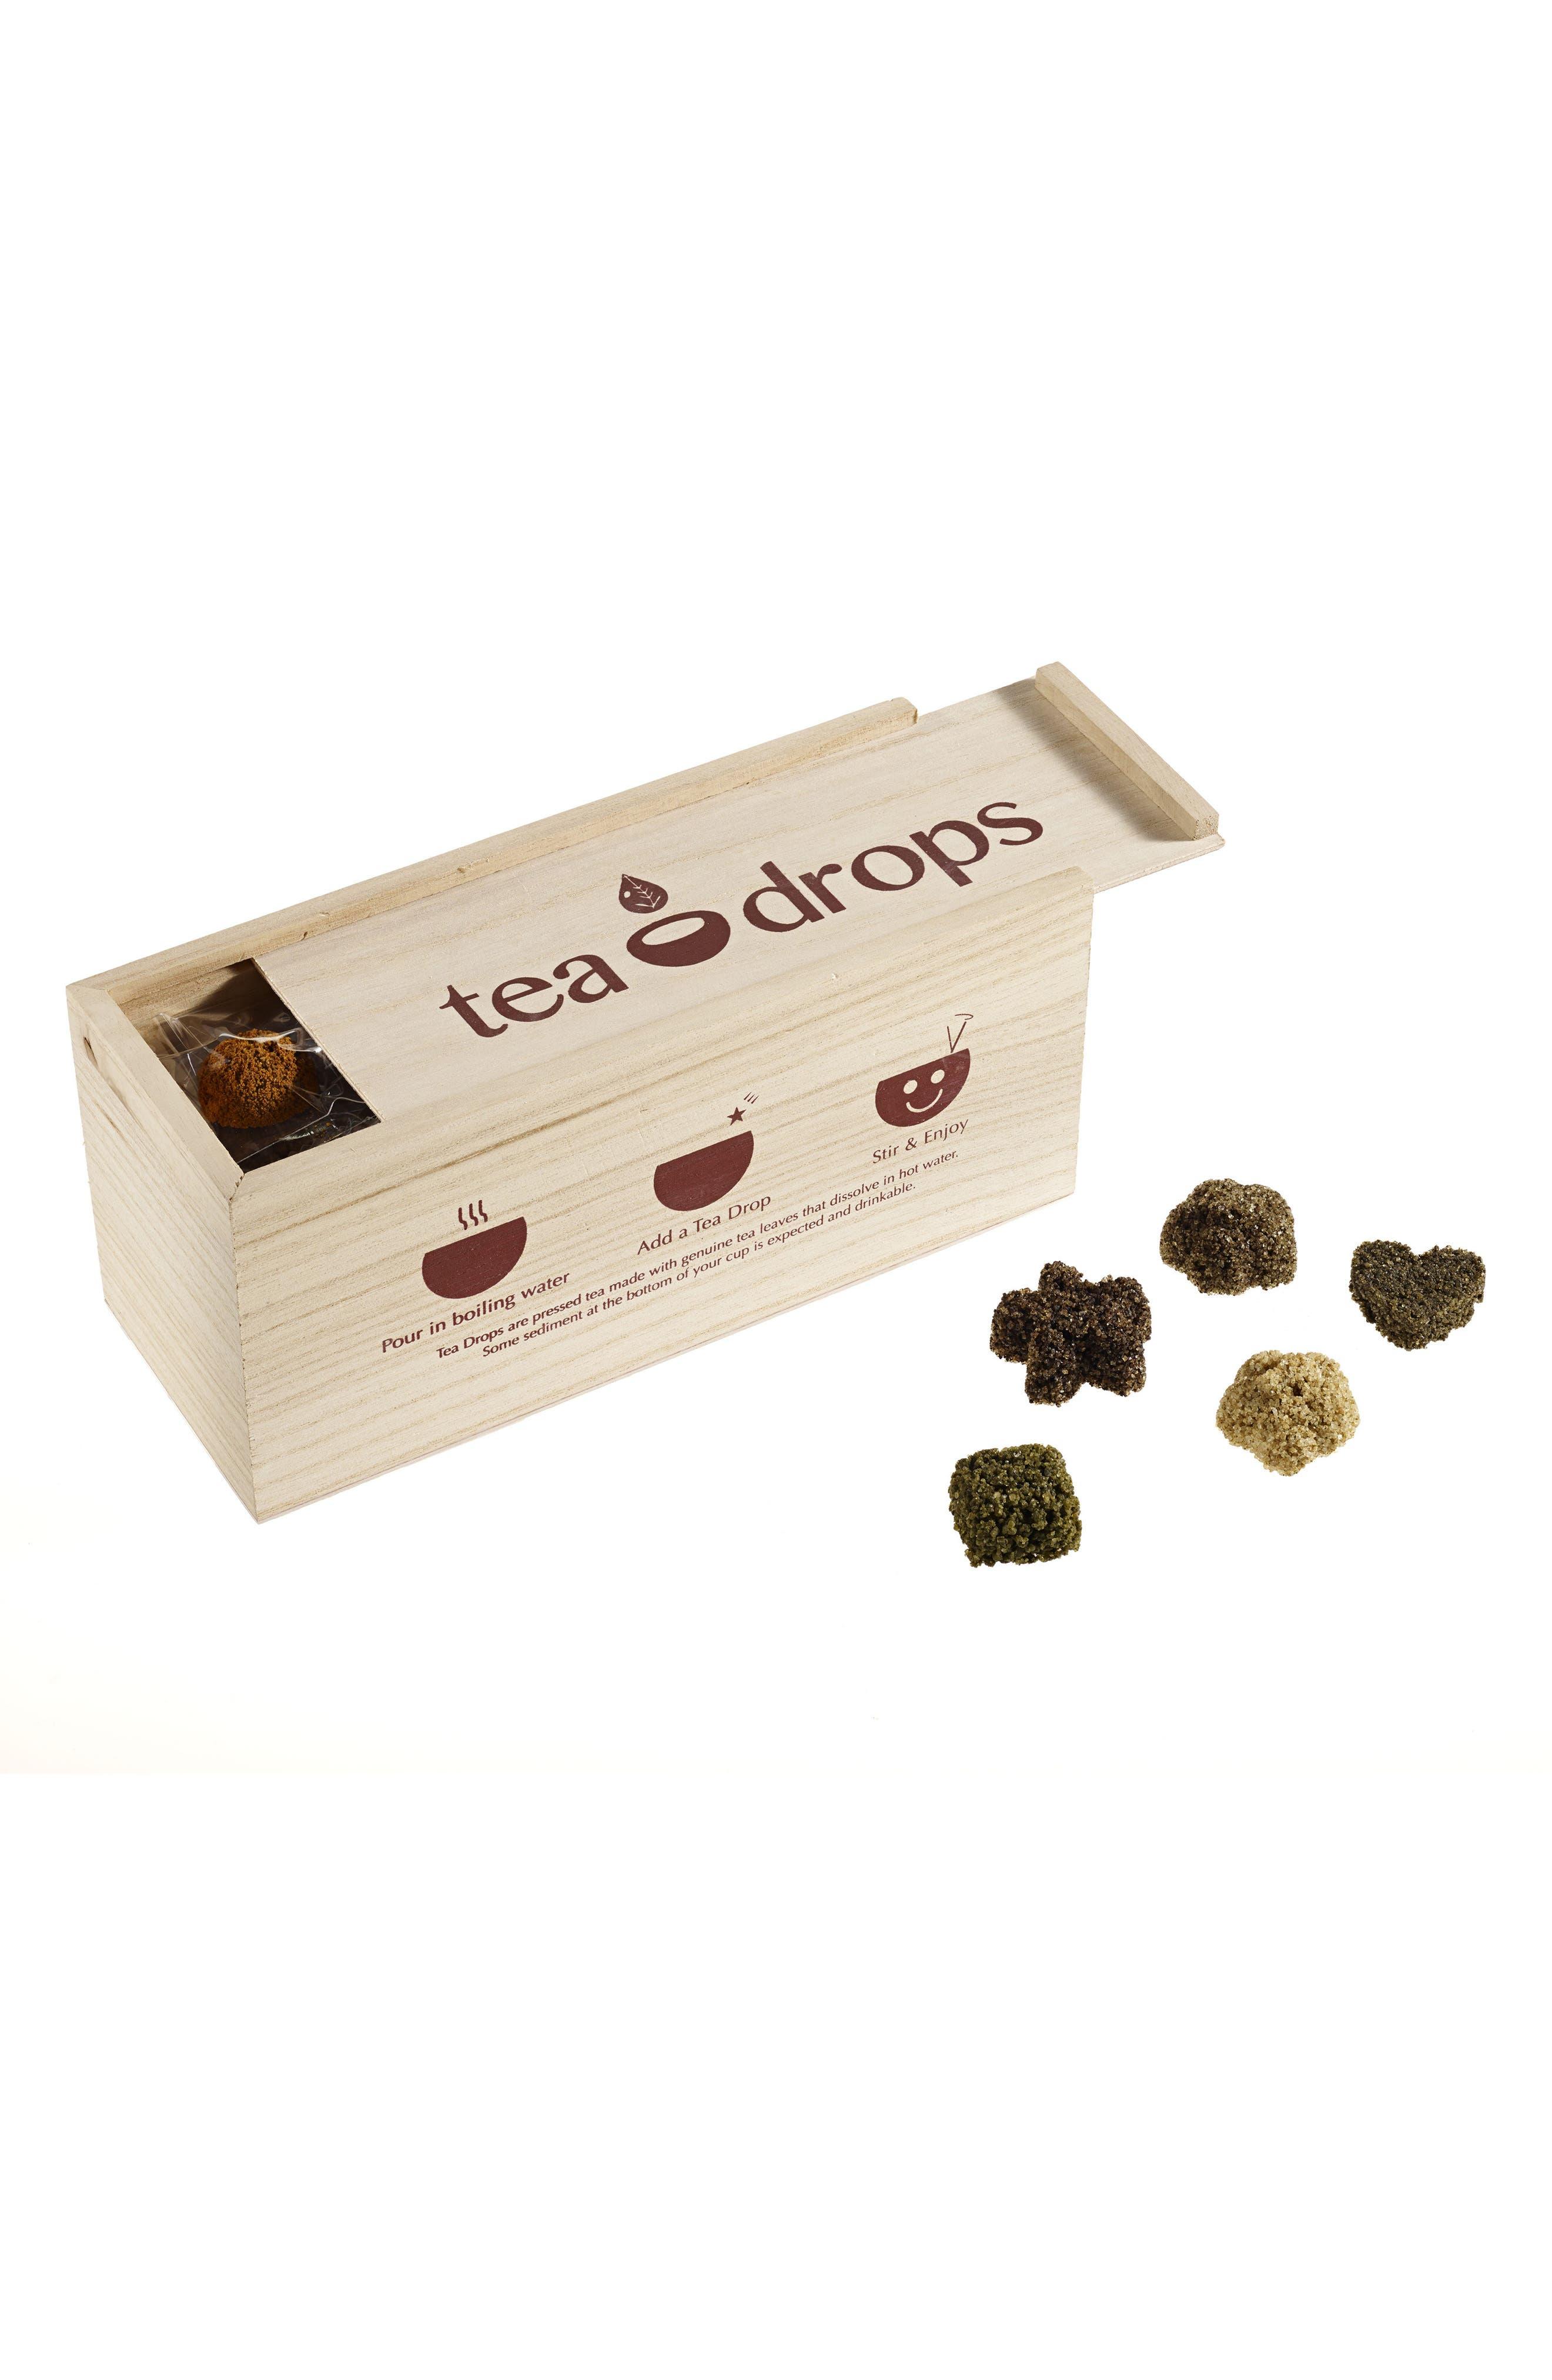 Alternate Image 1 Selected - Tea Drops Large Assortment Box